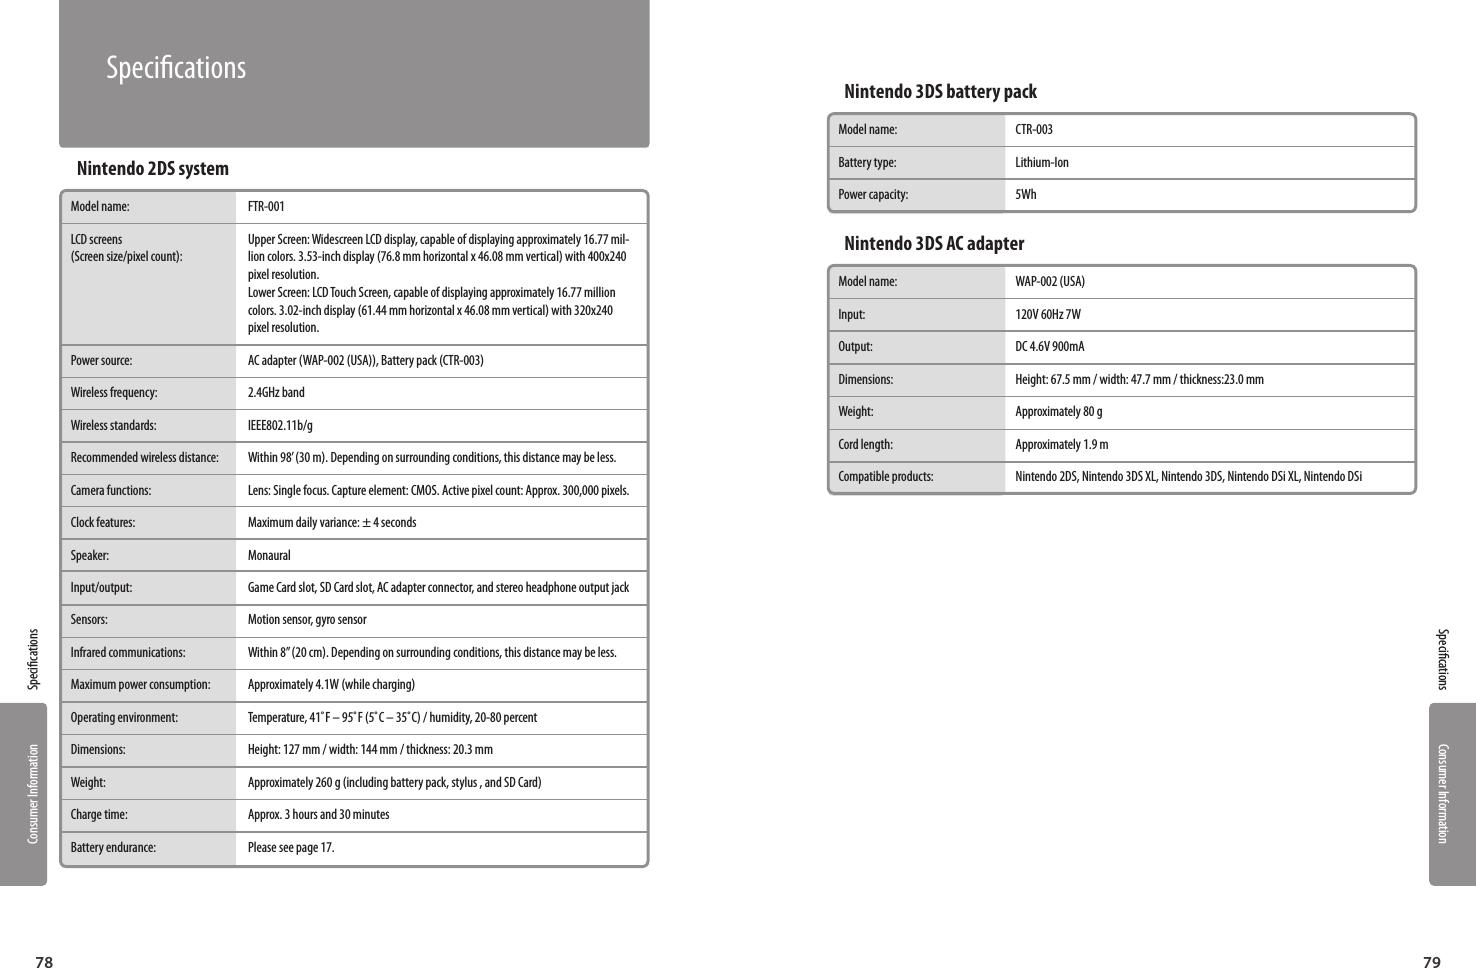 fifa 11 2ds instruction manuals